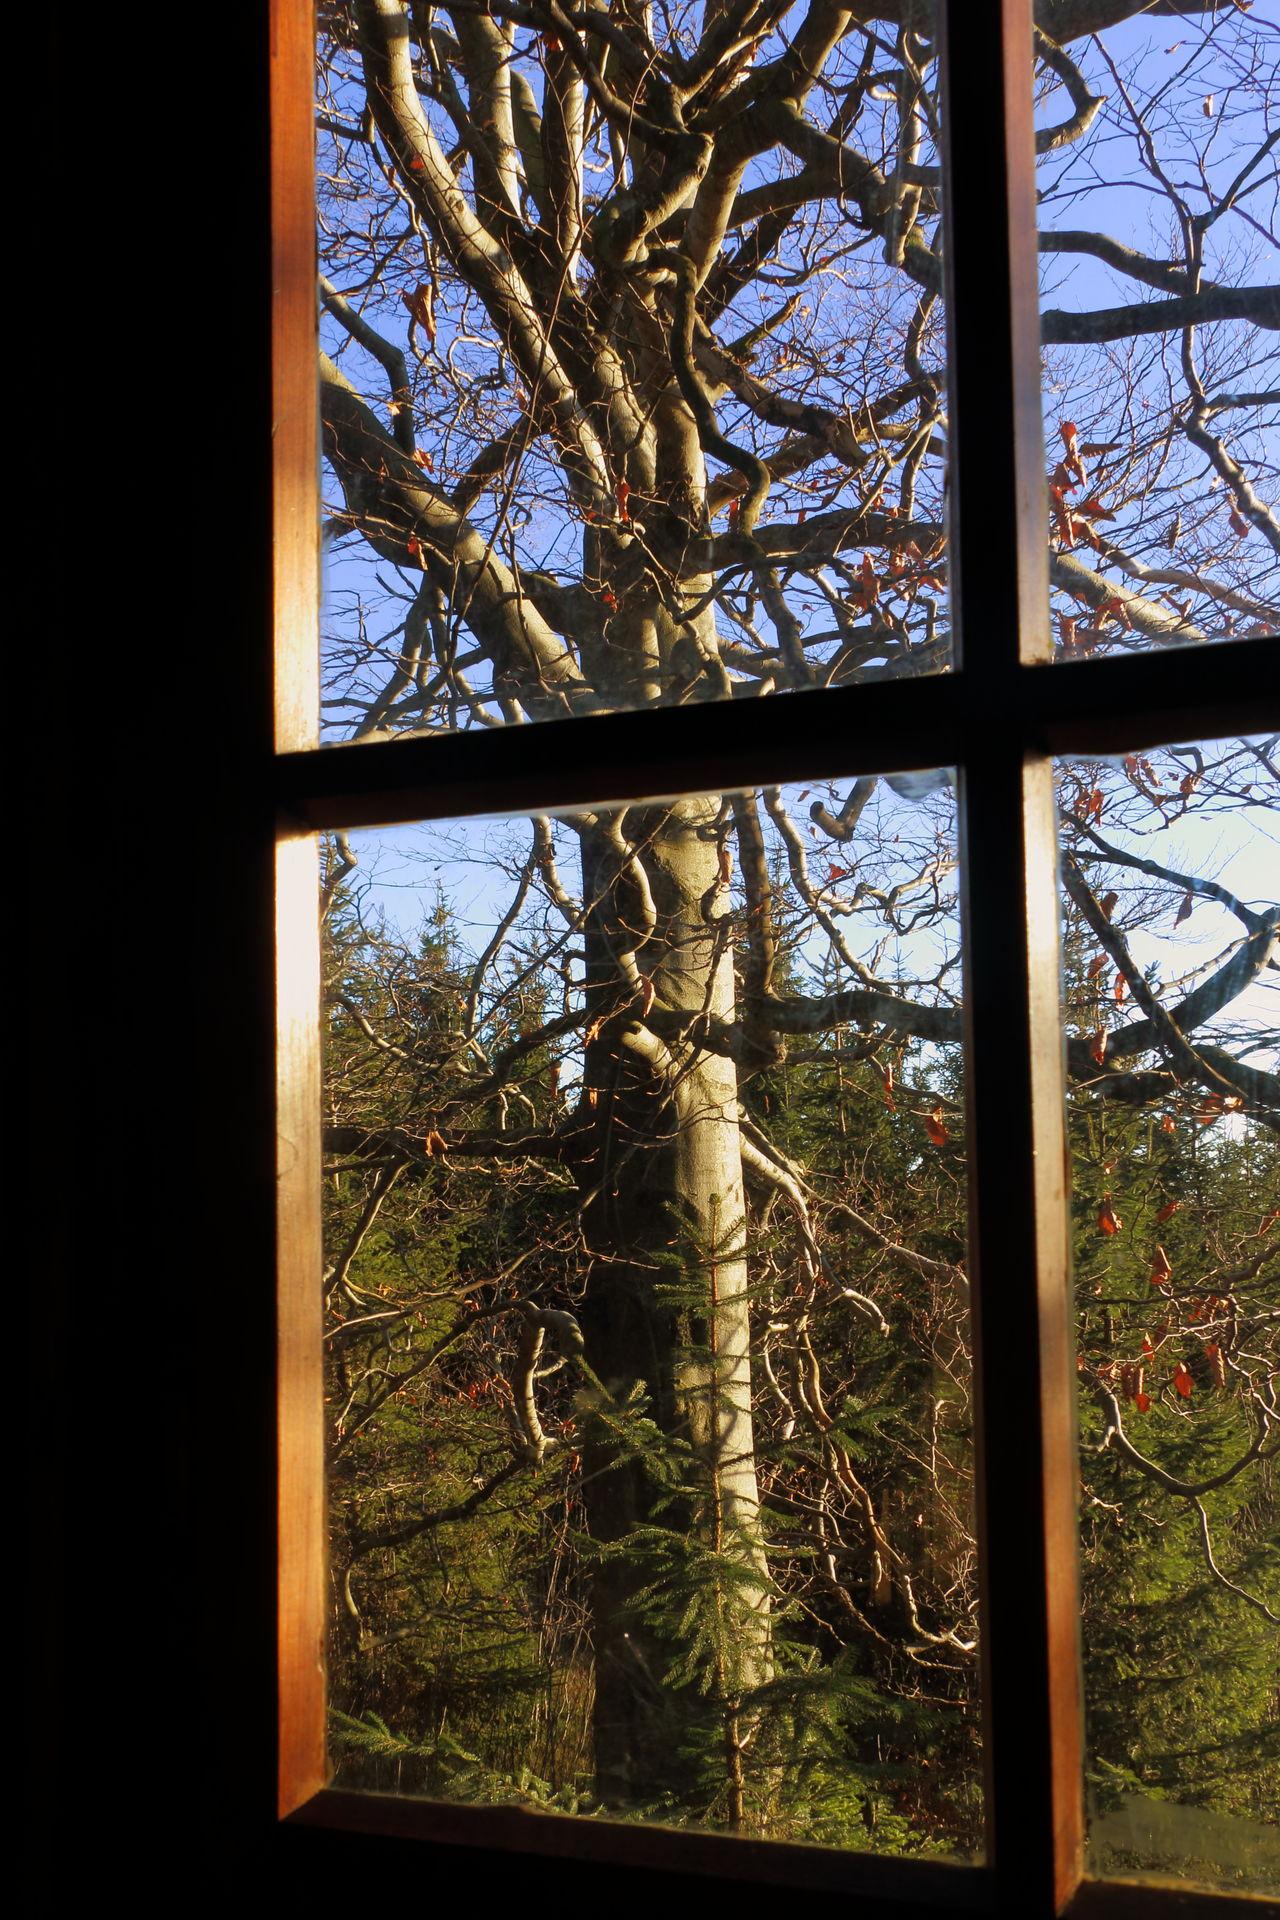 Poderatignom Ausblick Baum Blick Aus Dem Fenster Dark Dunkel Fenster Himmel Licht Light Natur Nature Sky Tree View View Out My Window Window